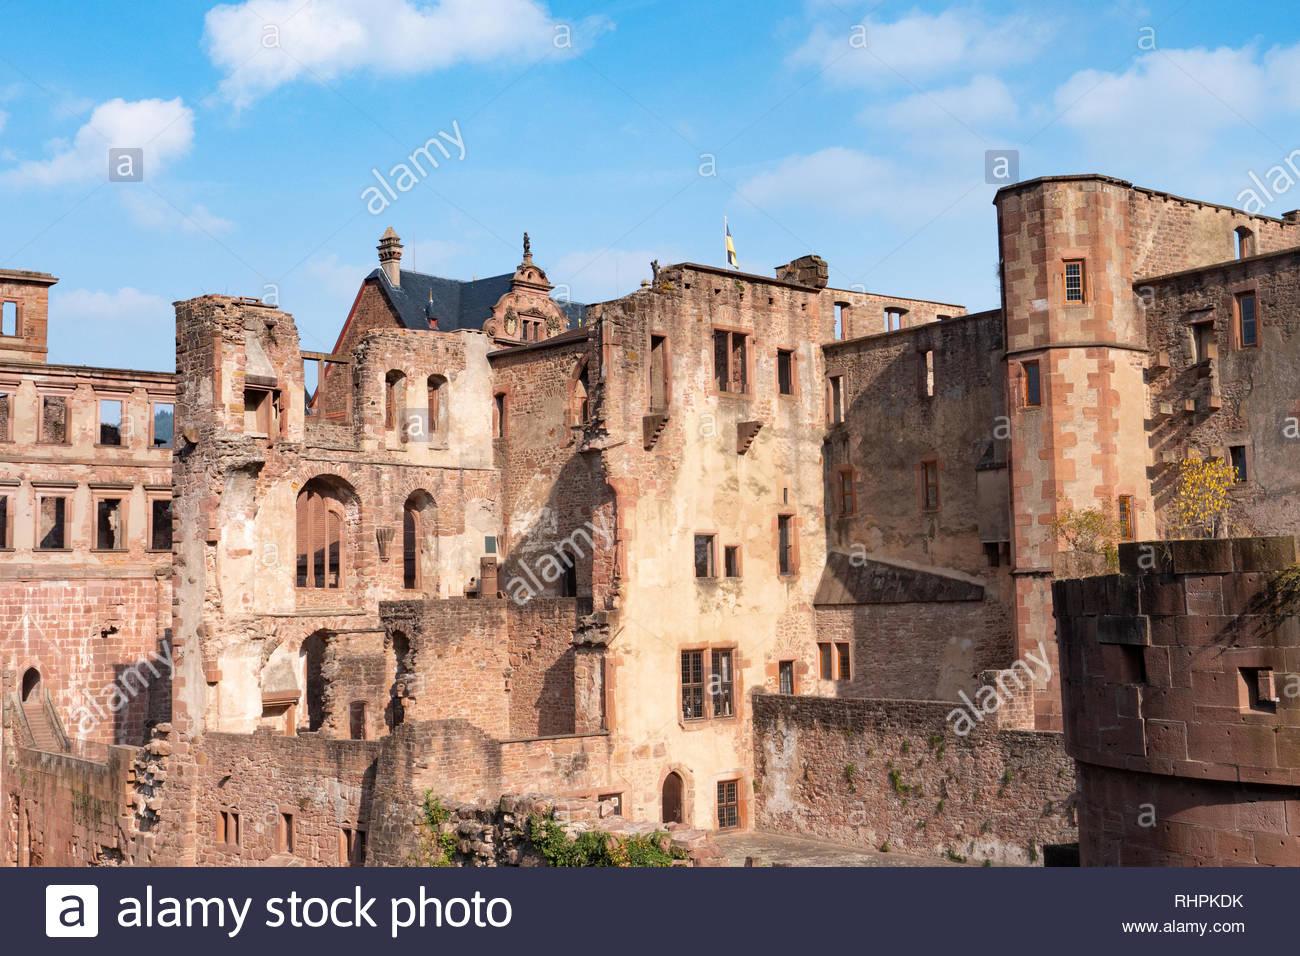 View landscape of inside of Heidelberg Castle and German called Heidelberger Schloss is a ruin in Germany and landmark of Heidelberg. Stock Photo